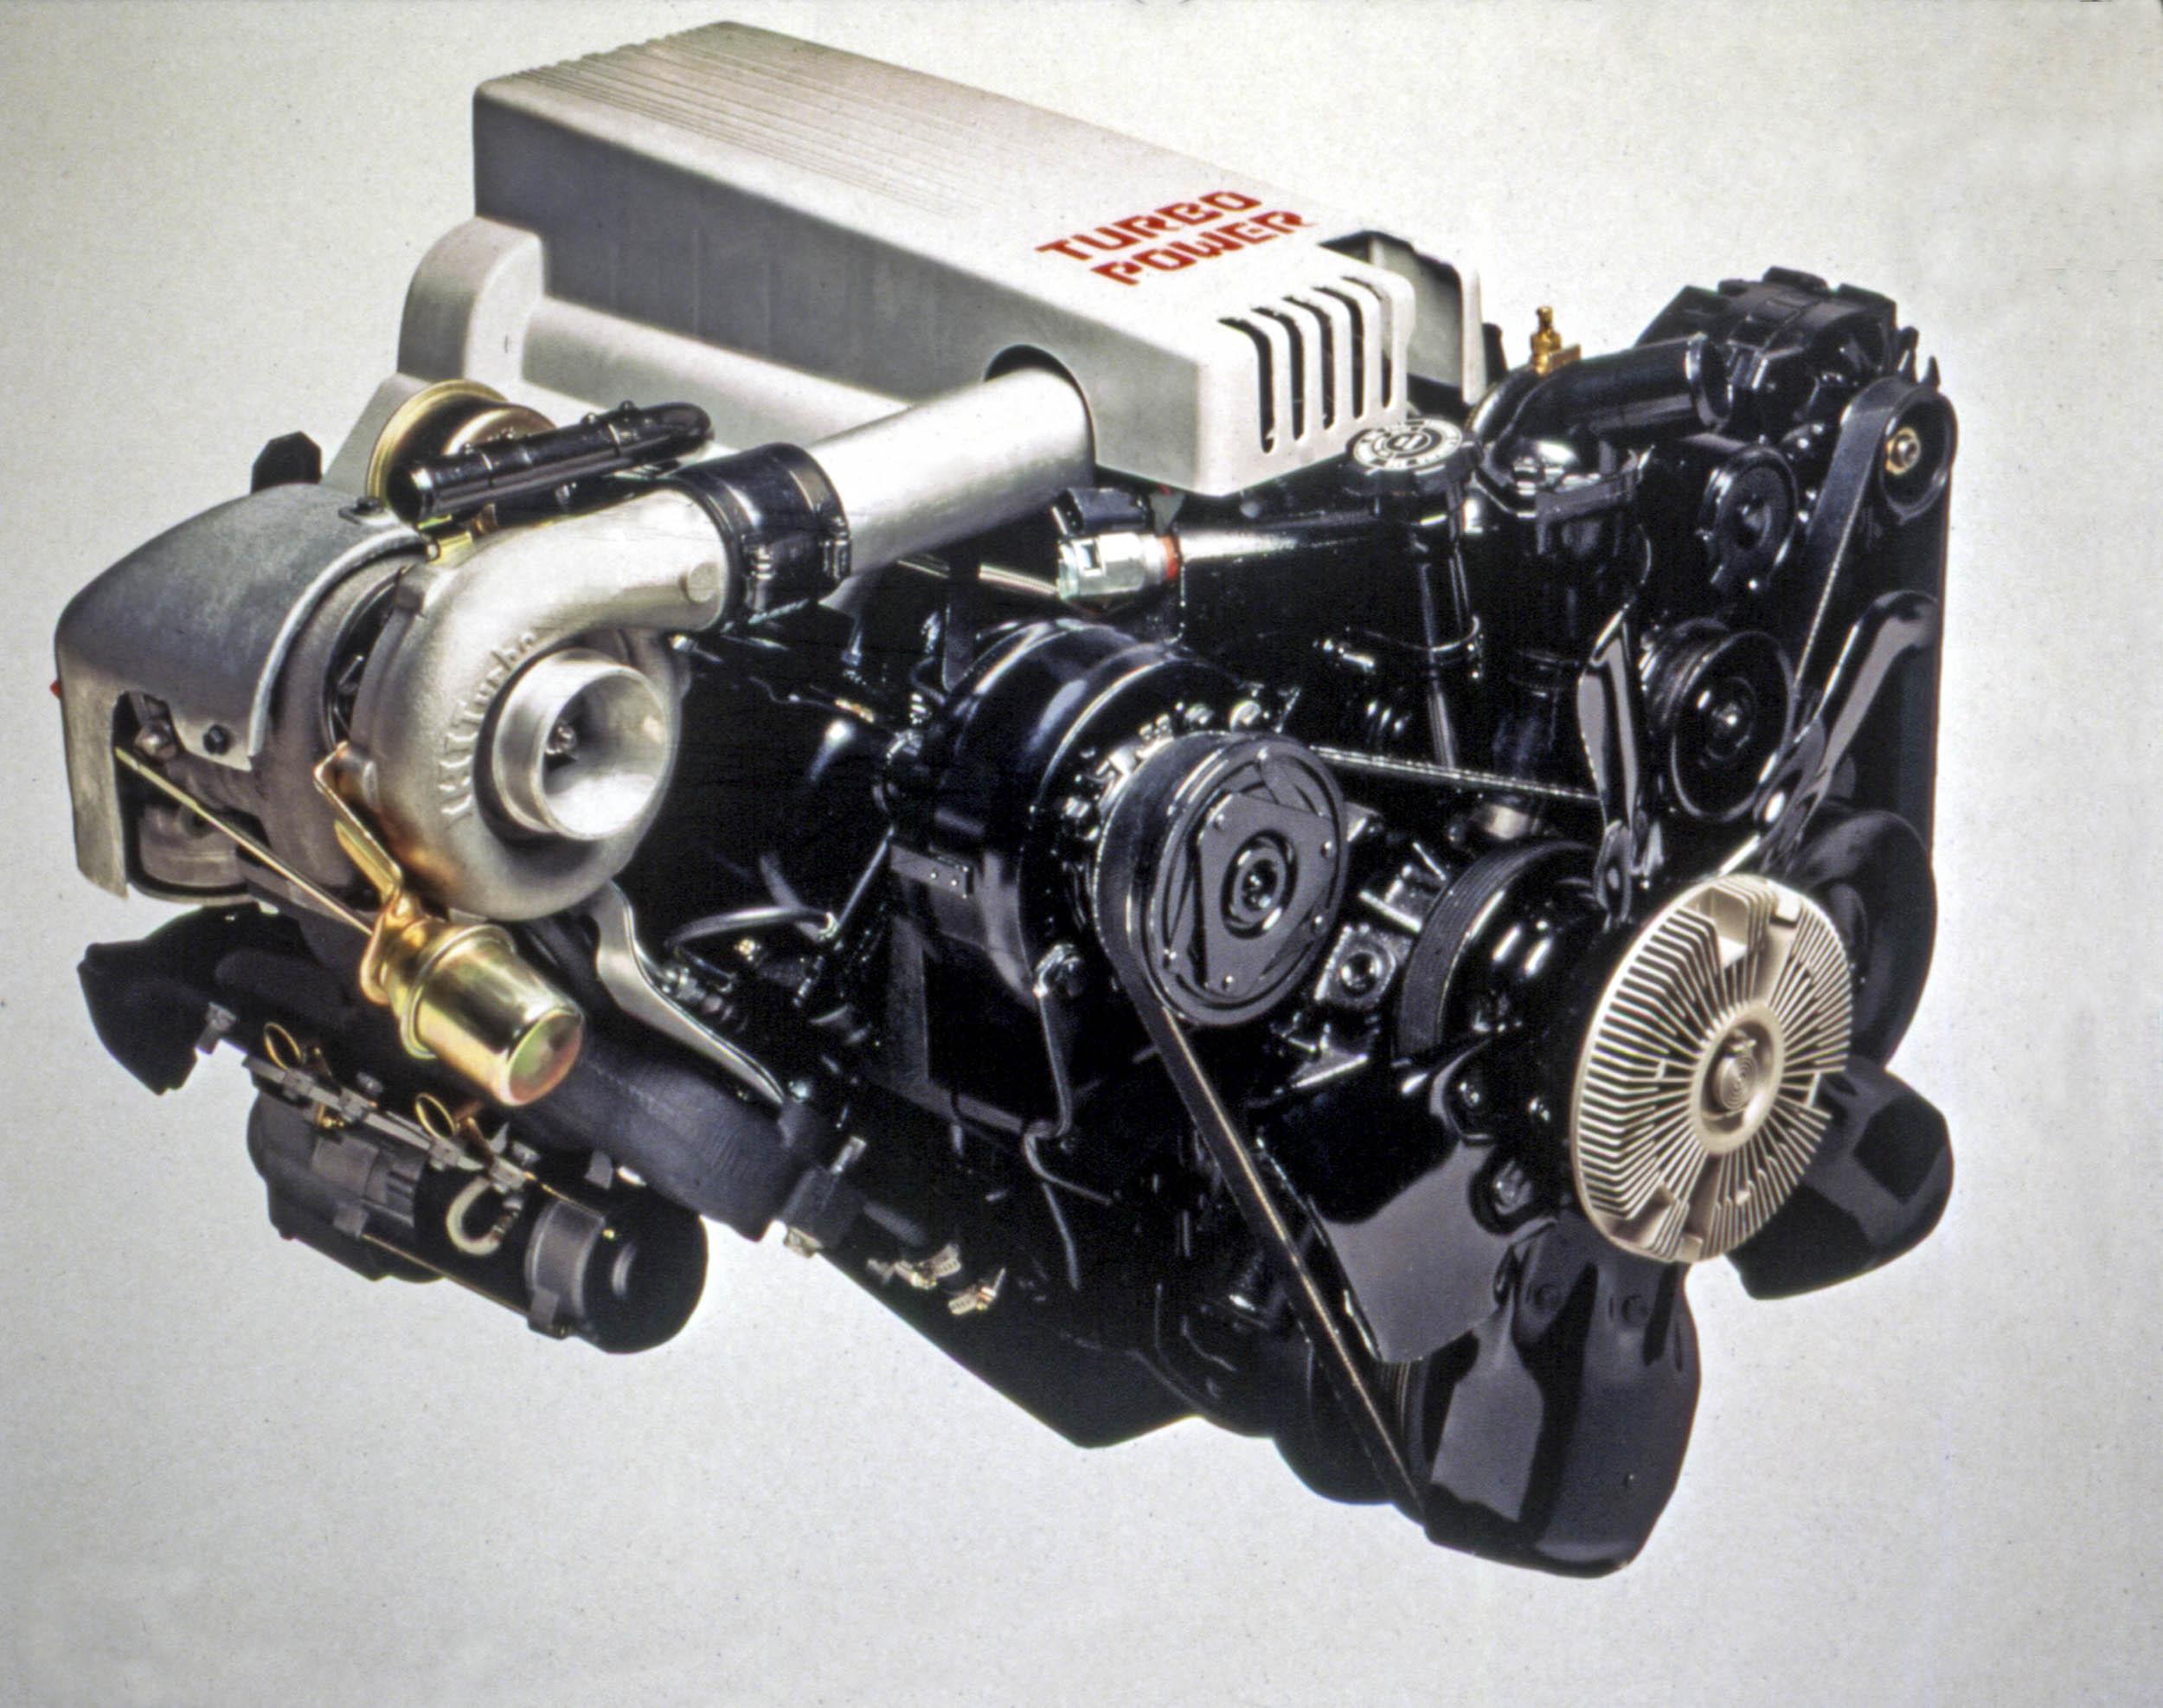 1991 Syclone engine